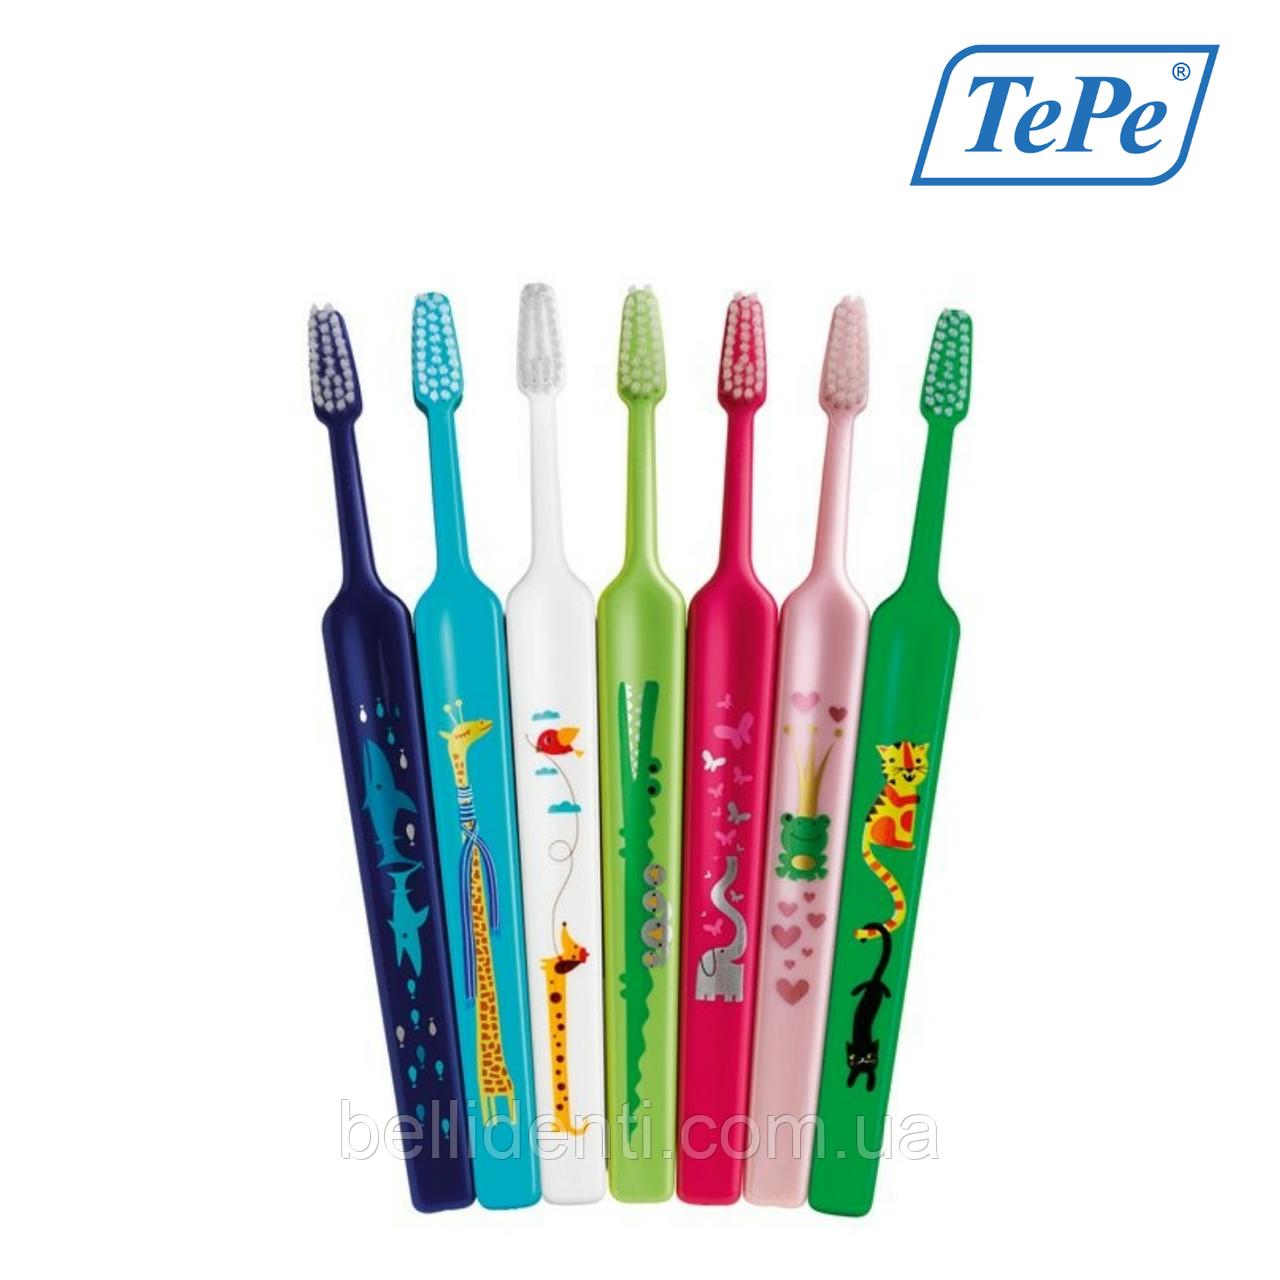 Детская зубная щетка TePe Kids Soft (от 3-х лет)